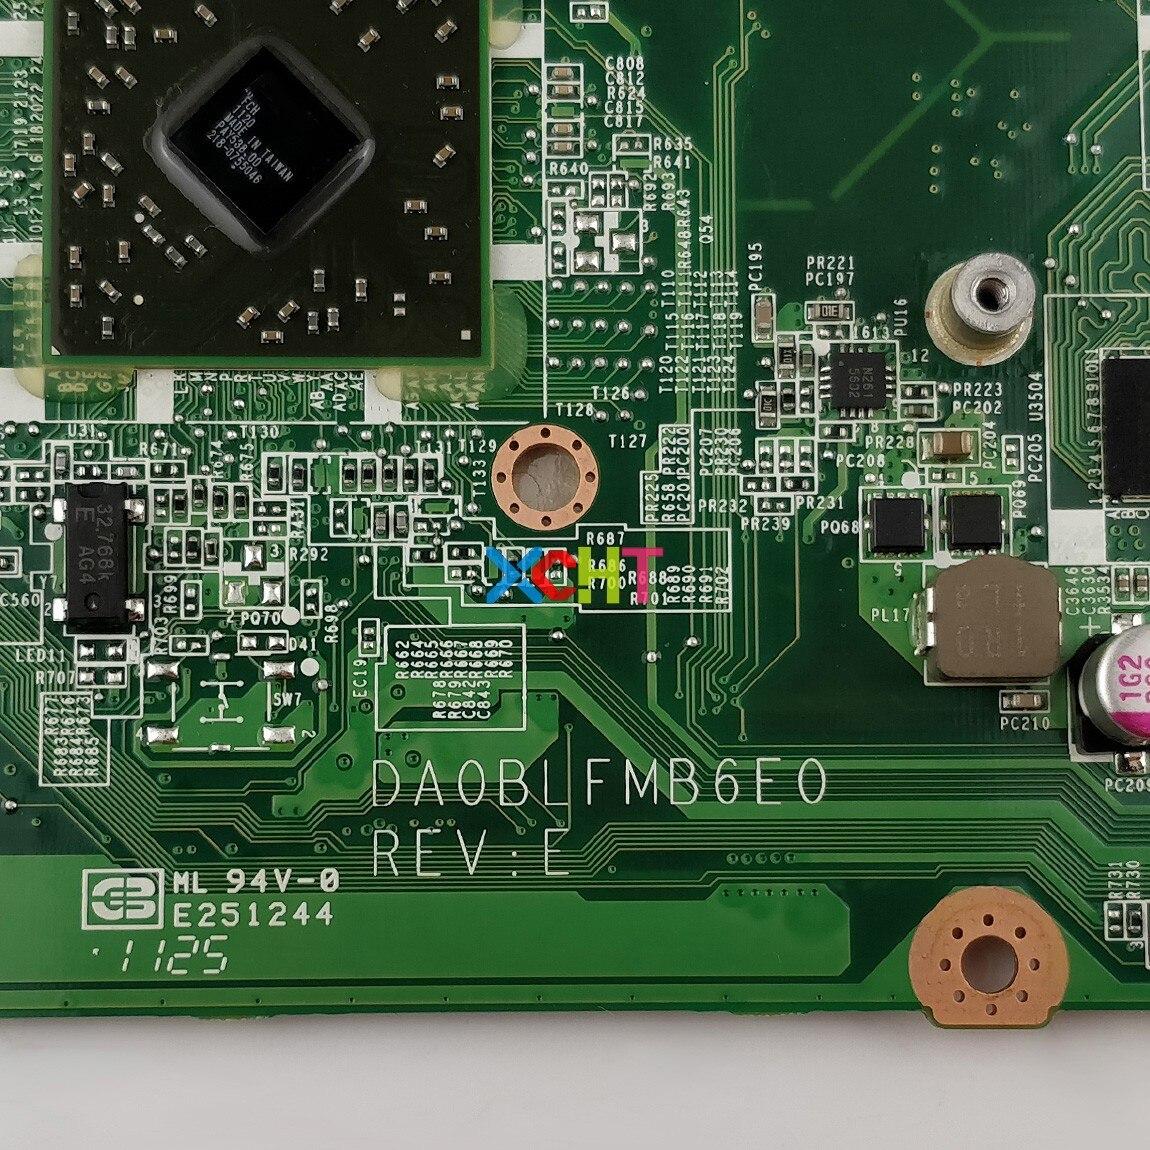 Image 5 - A000081310 DA0BLFMB6E0 w GT525M/1 GB графика для Toshiba L750D L750 L755D ноутбук ПК Материнская плата ноутбука протестирована-in Материнская плата для ноутбука from Компьютер и офис on AliExpress - 11.11_Double 11_Singles' Day